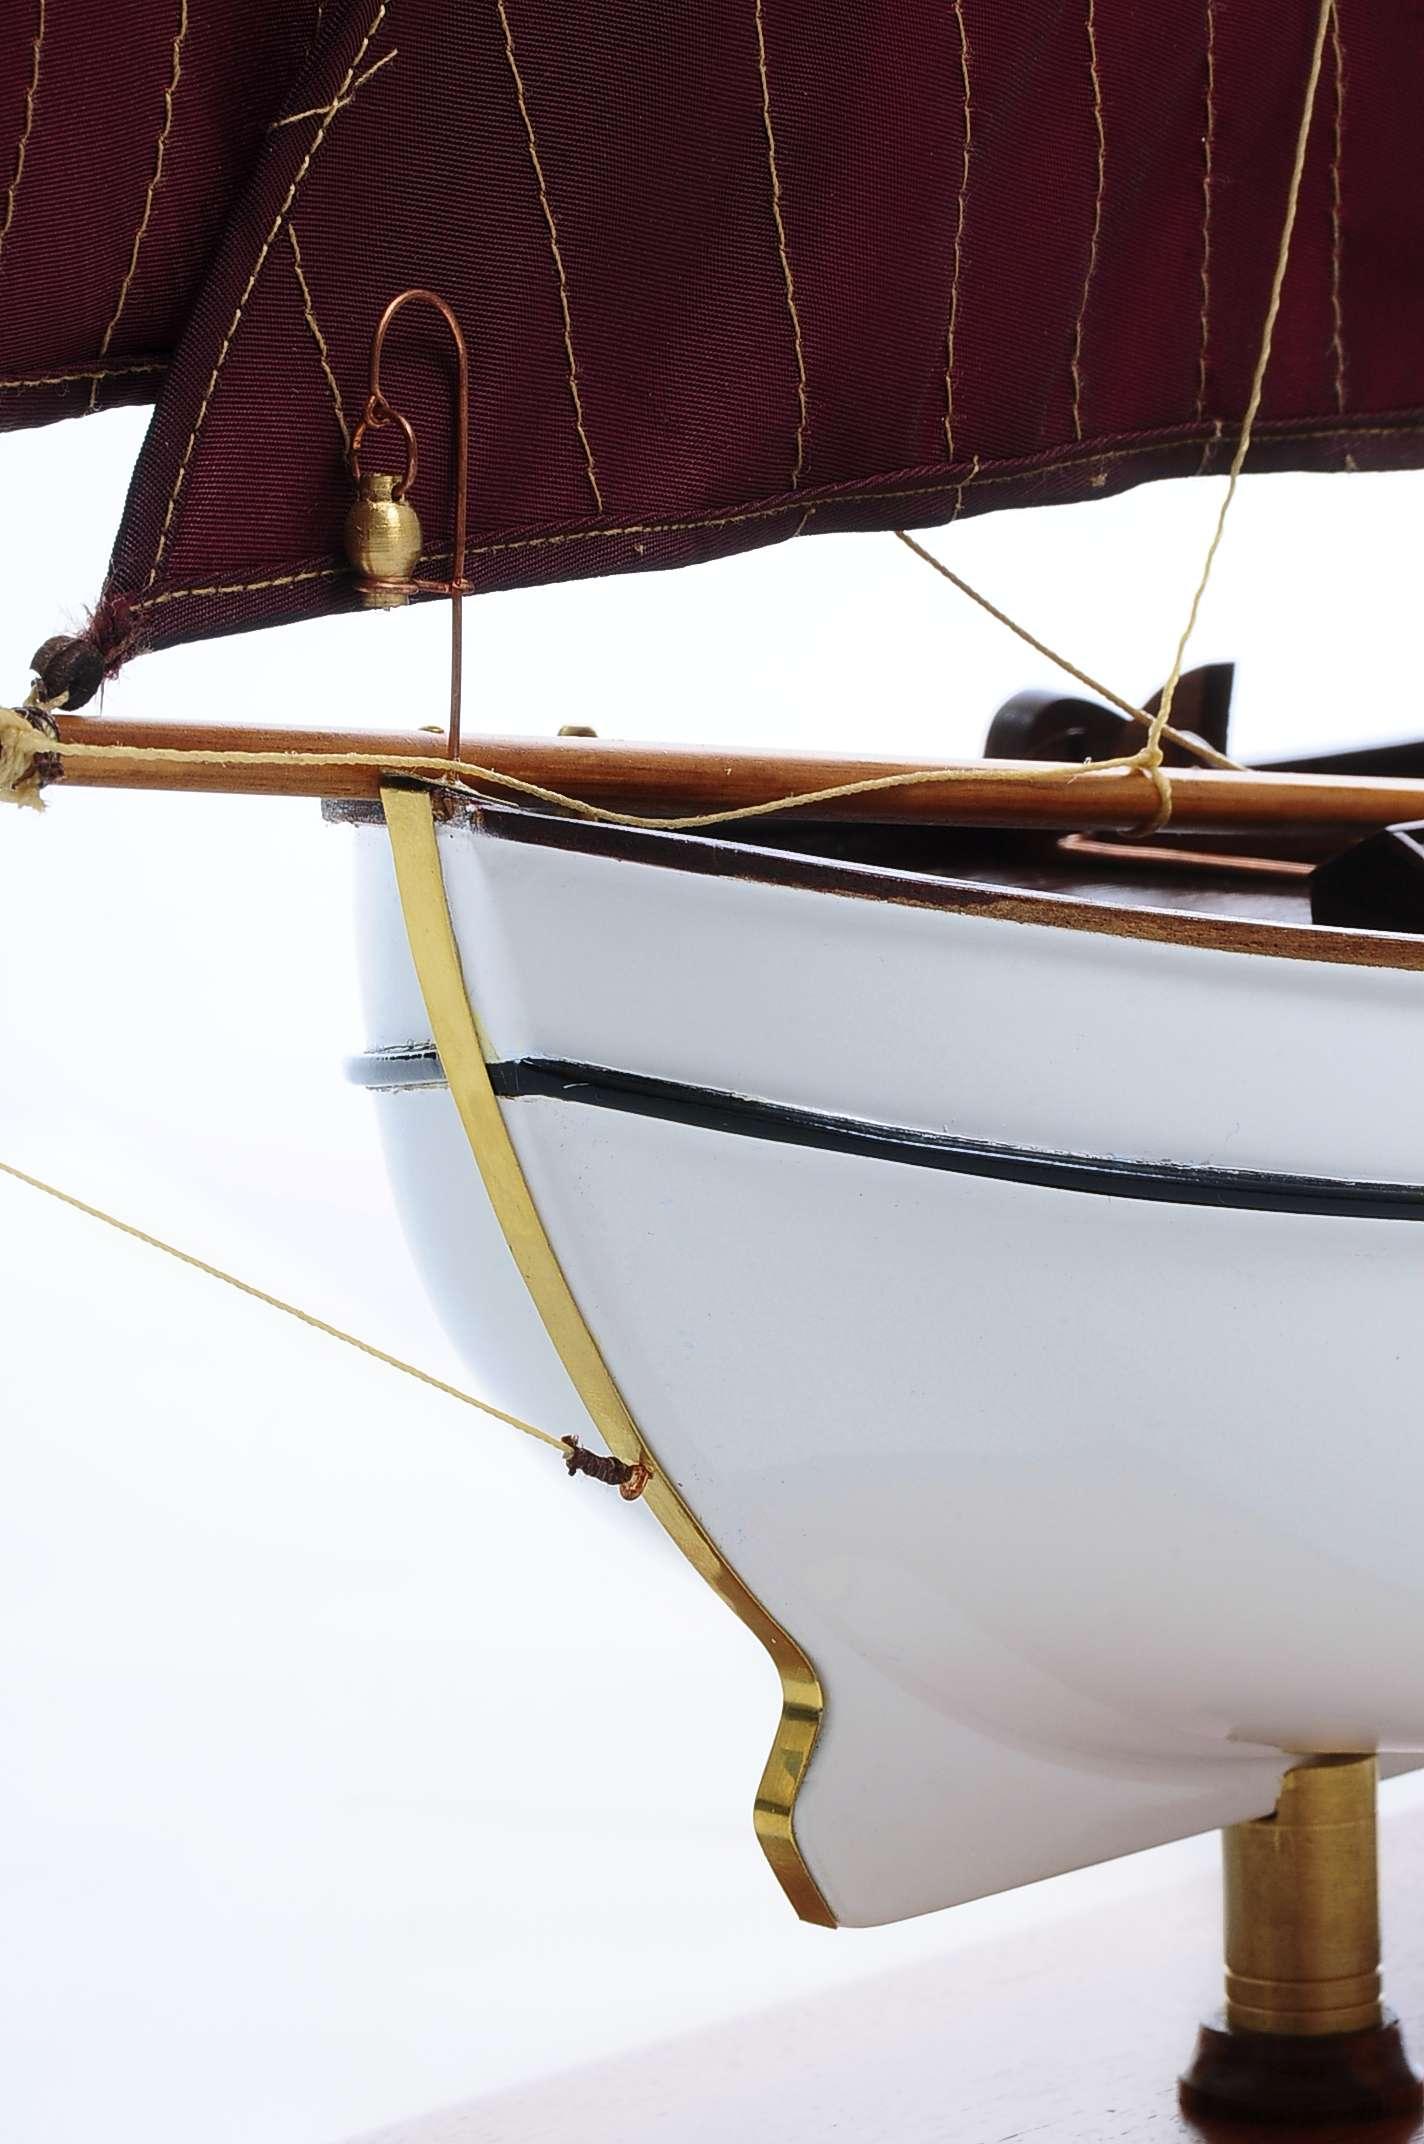 1432-4575-Dutch-Marker-Roundbow-Model-Boat